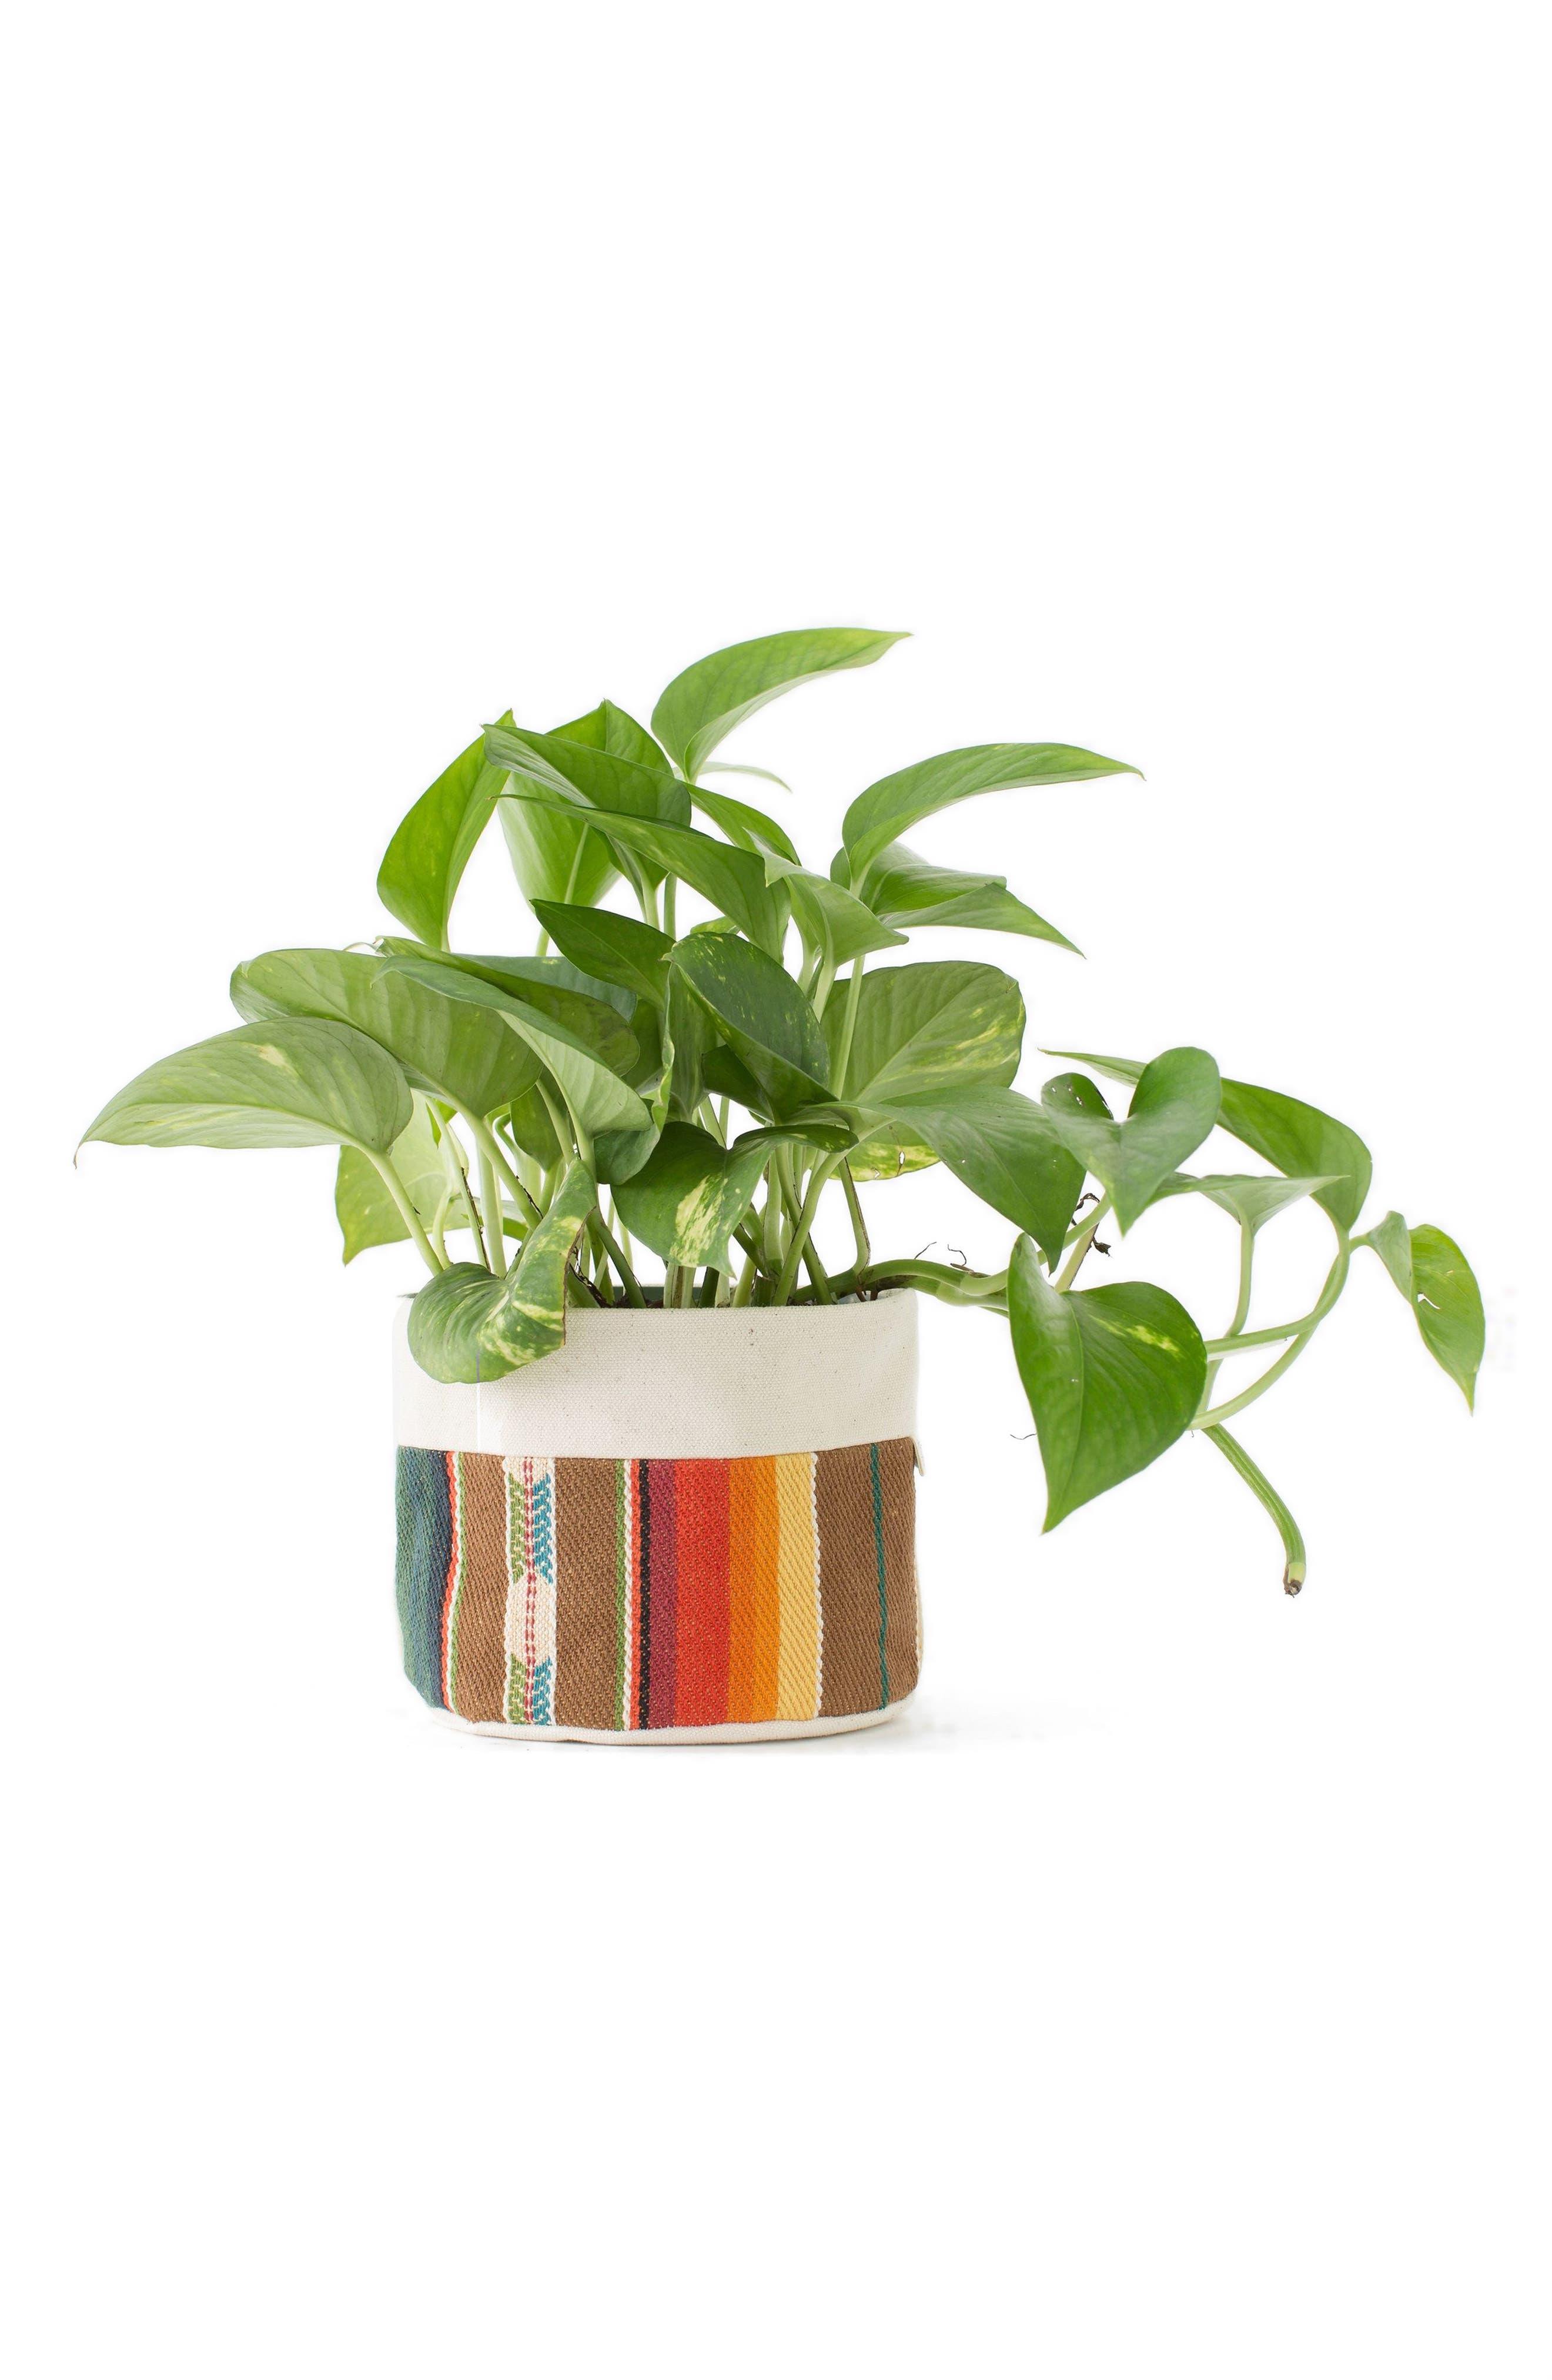 GOOD COMPANY WARES 6-Inch Striped Canvas Planter